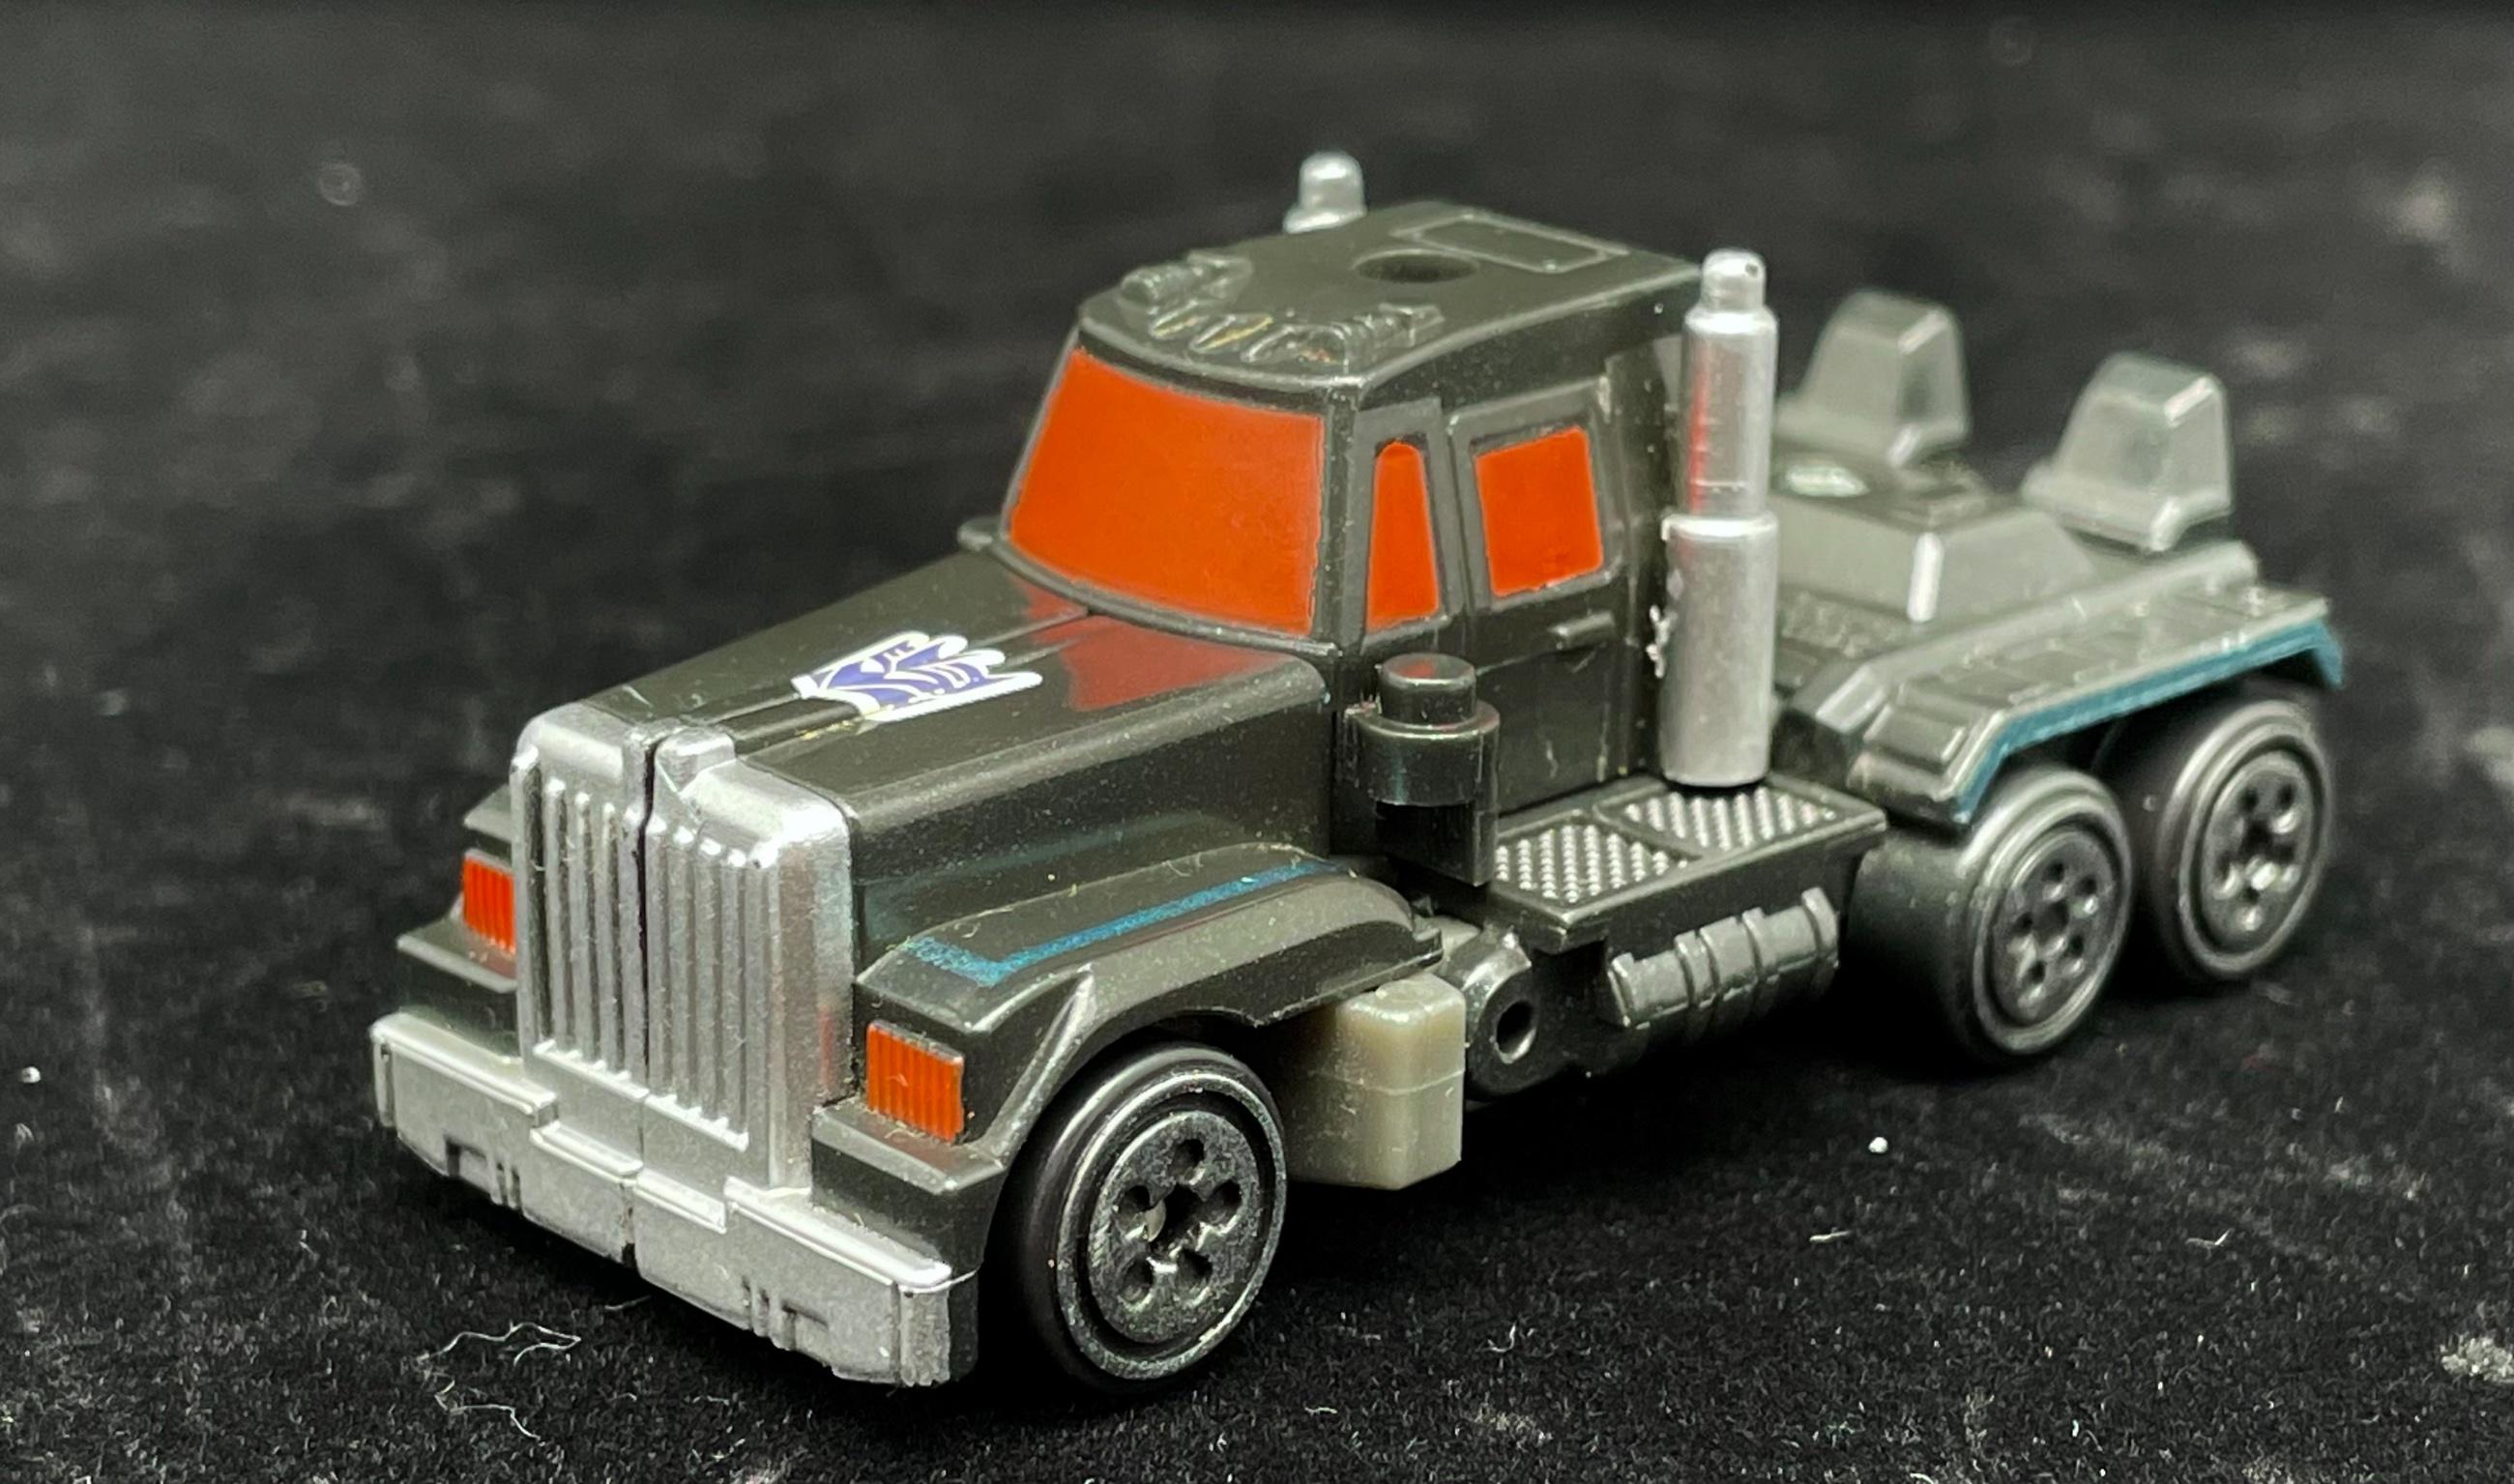 B2350526-FA51-47F7-A8C6-C6FCD19BFE54.jpeg